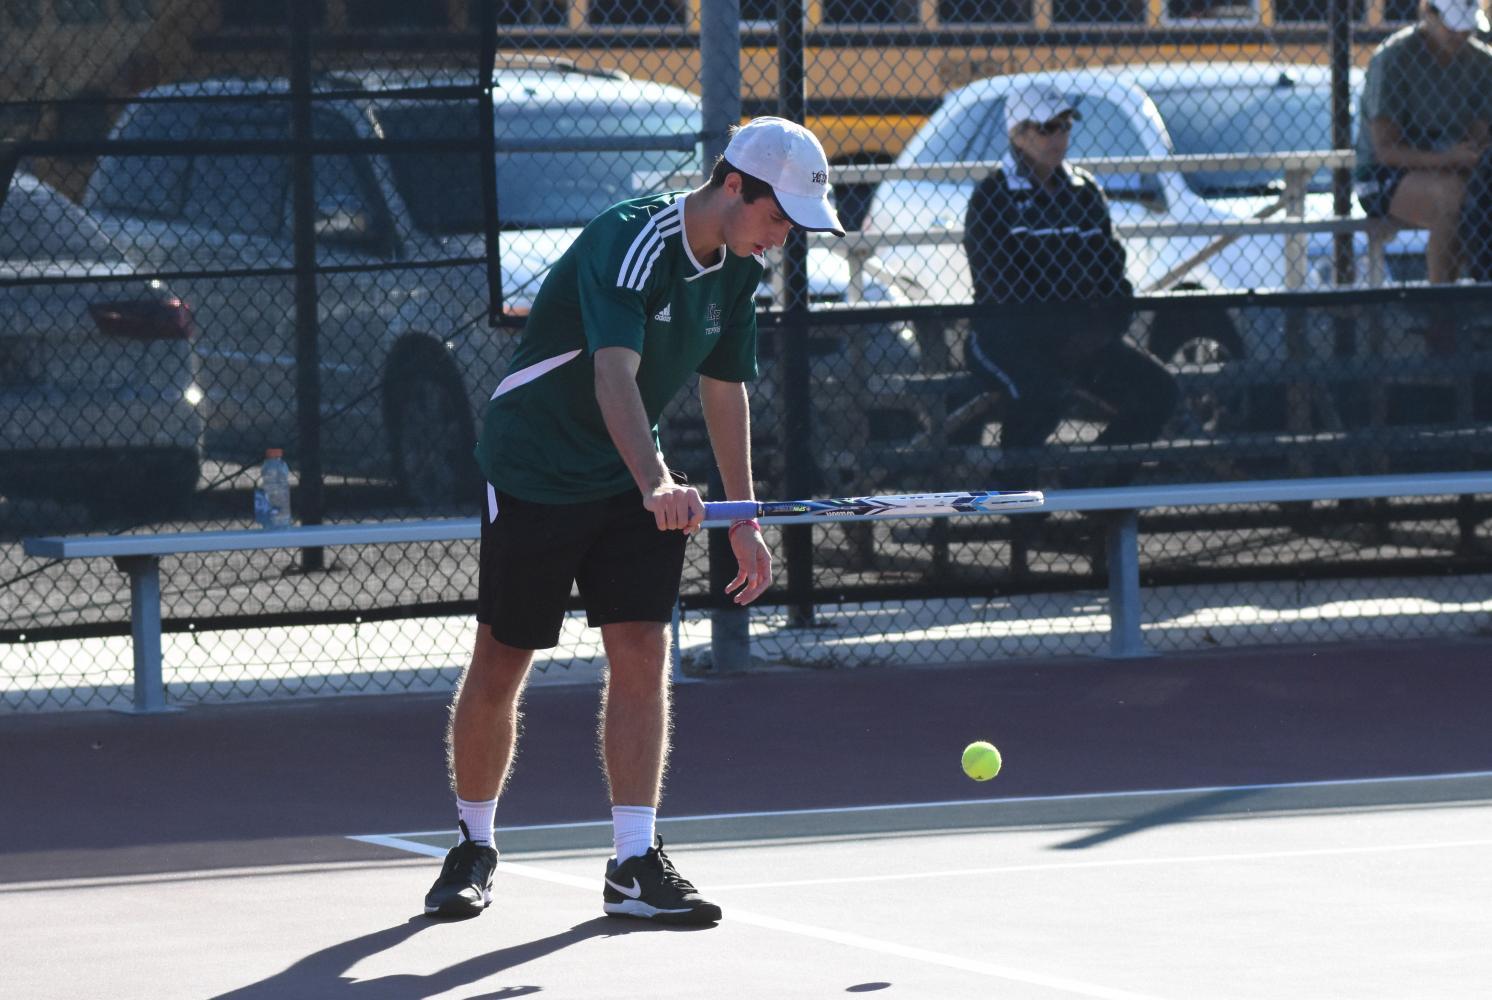 Guynes bounces a tennis ball before a serve during a tournament at K-Park.